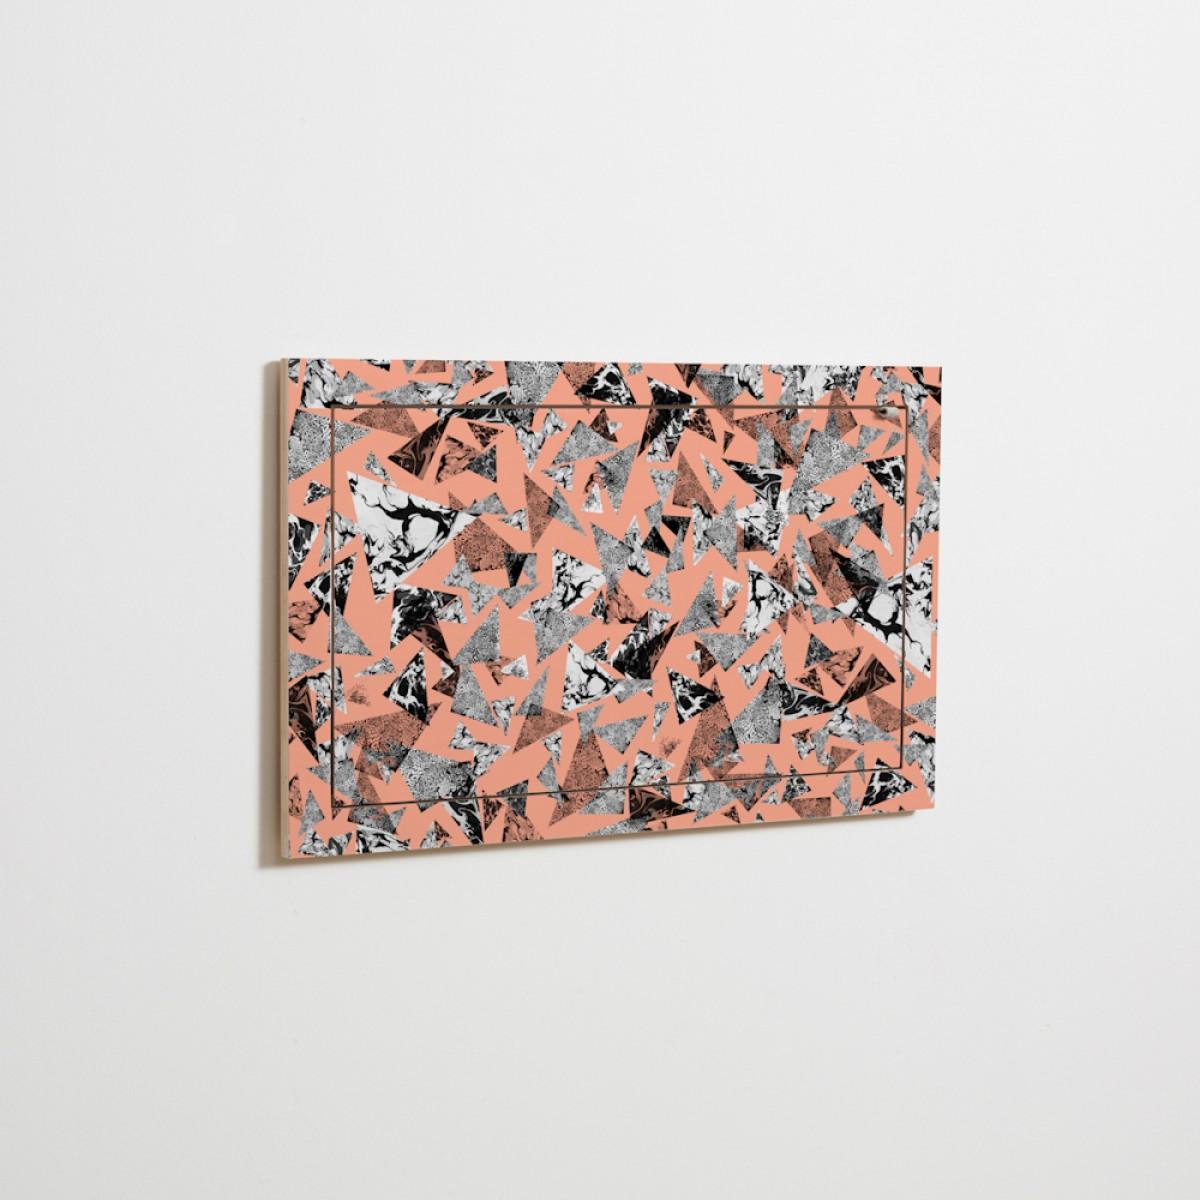 Fläpps Sekretär/in – PS Collage 3 by Pattern Studio